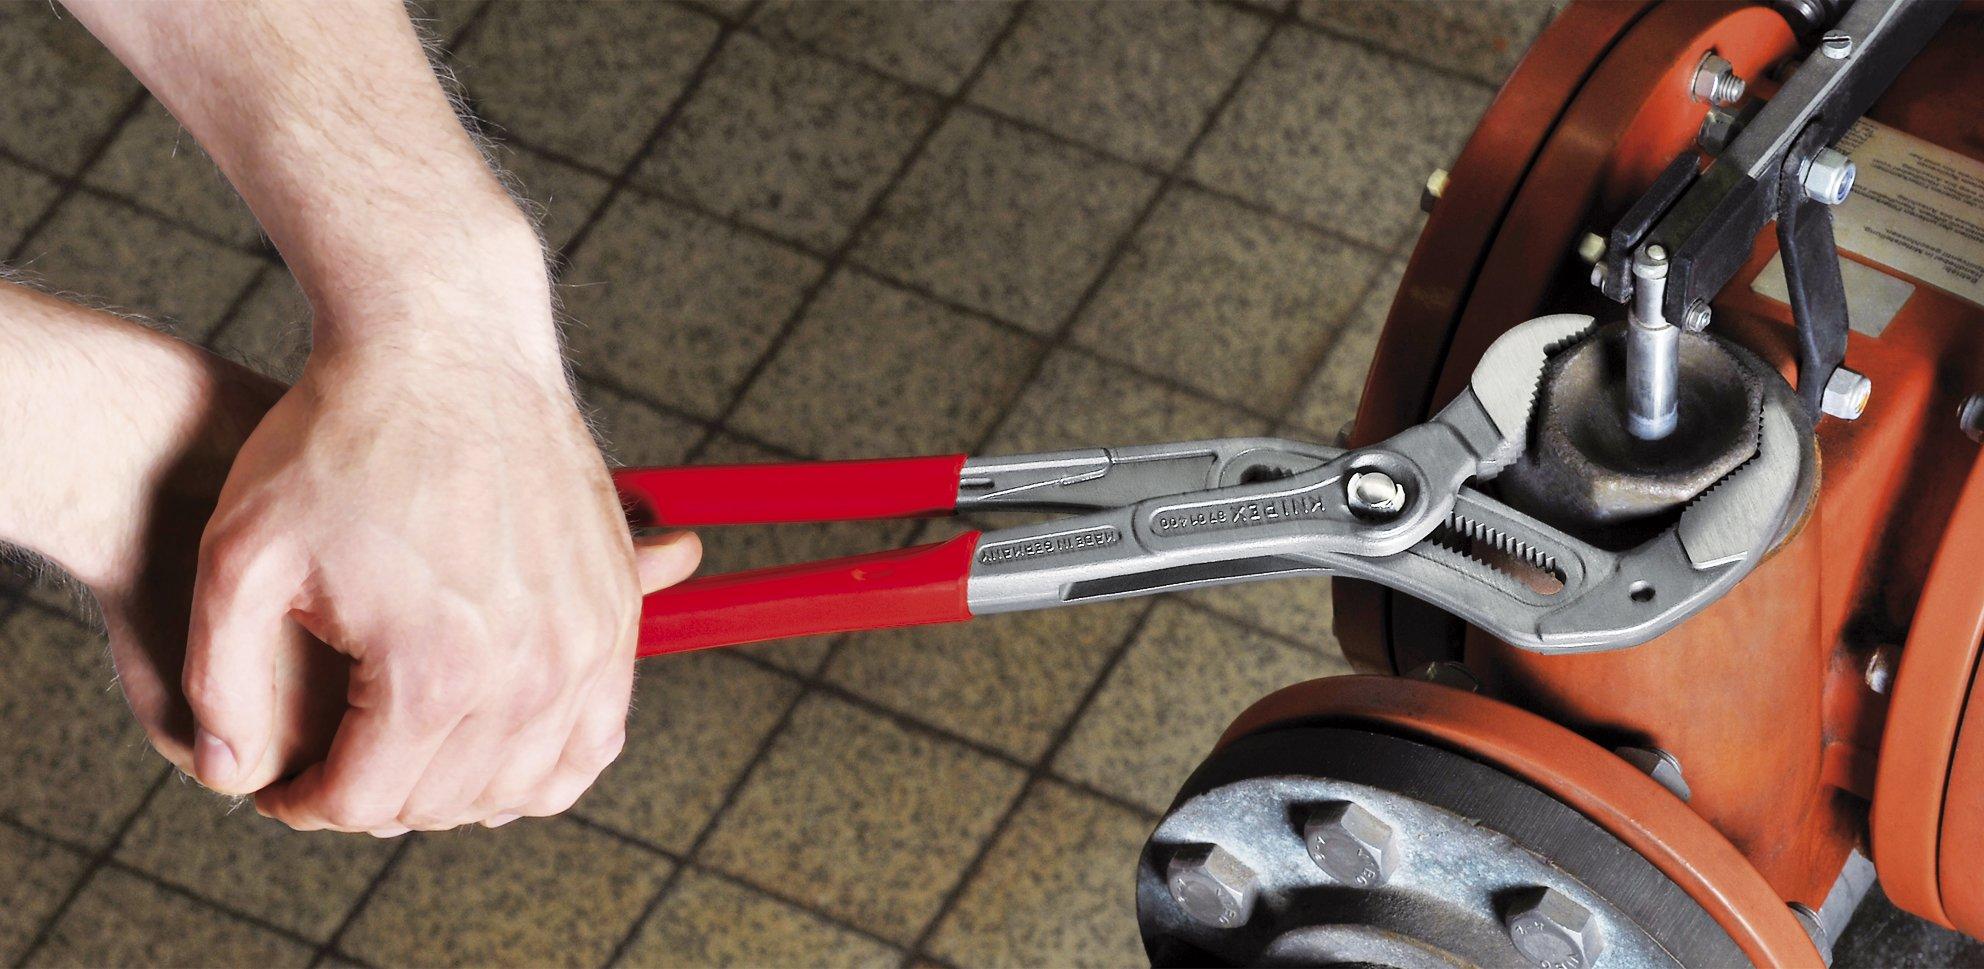 KNIPEX 87 01 400 SBA Cobra Pliers by KNIPEX Tools